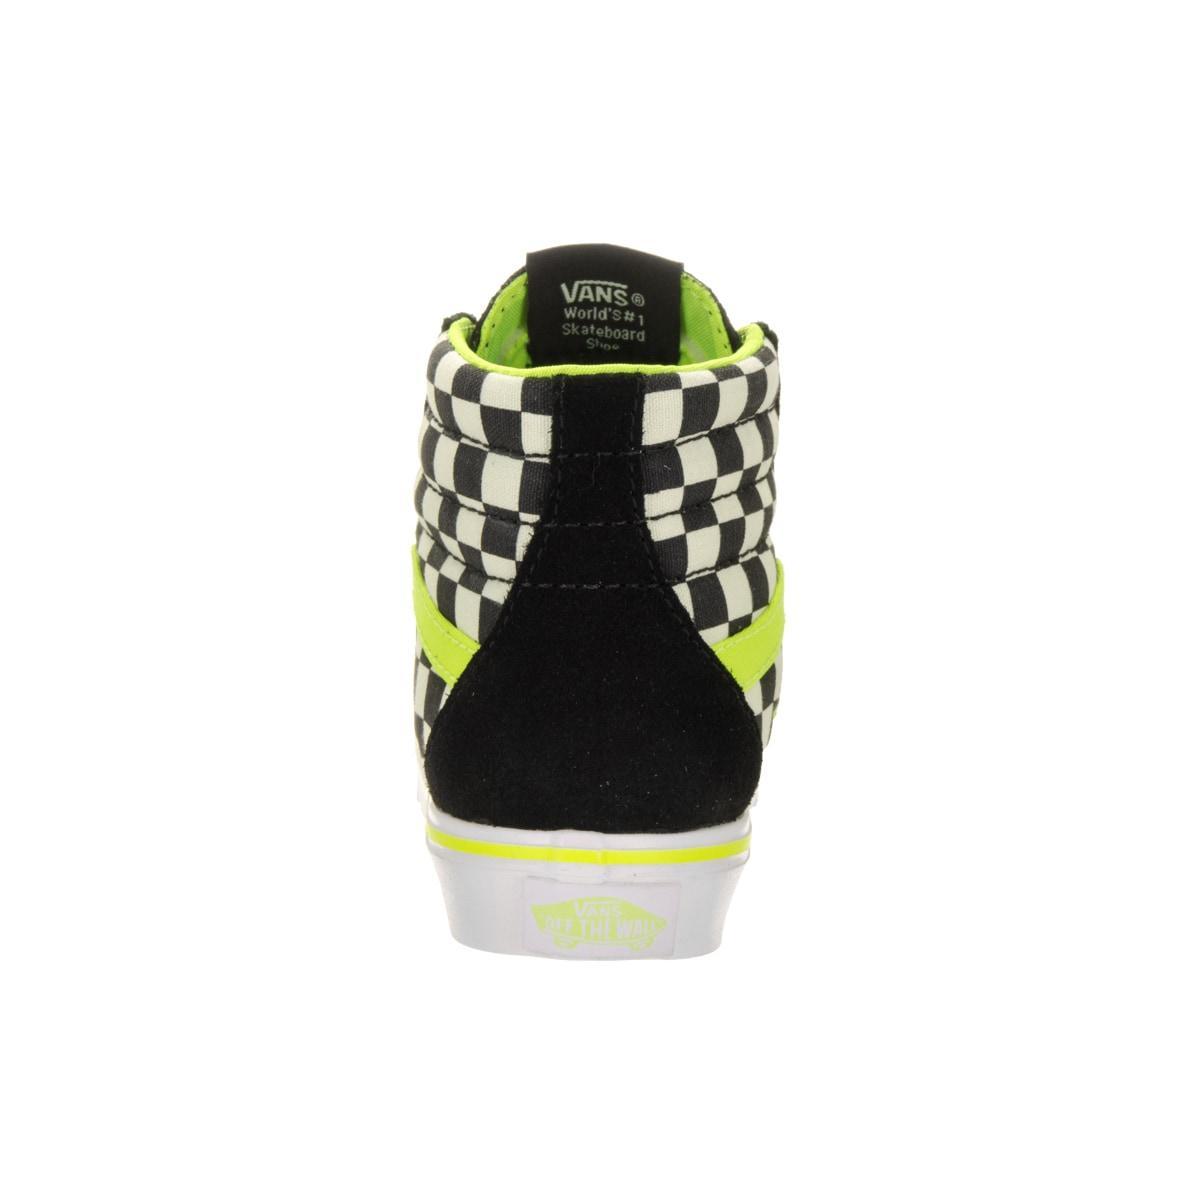 9ae0b8cfa1 Shop Vans Kids  Sk8-Hi Reissue Li Freshness Black Suede Skate Shoes - Free  Shipping Today - Overstock.com - 14012171